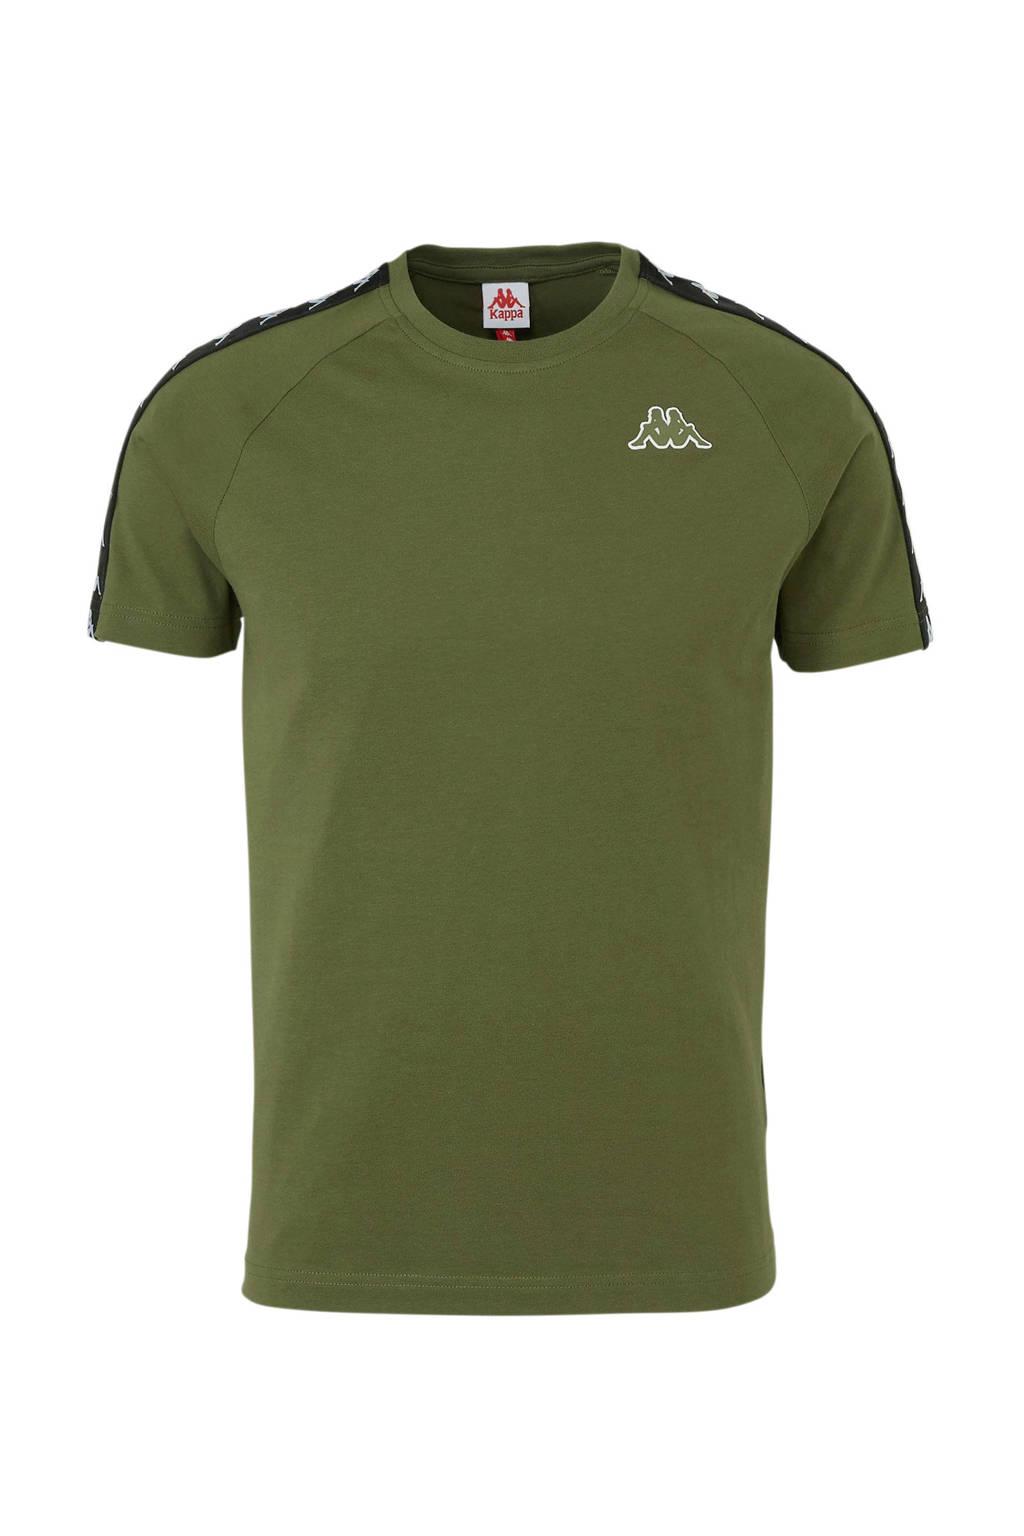 Kappa   T-shirt met contrastbies groen/zwart, Groen/zwart